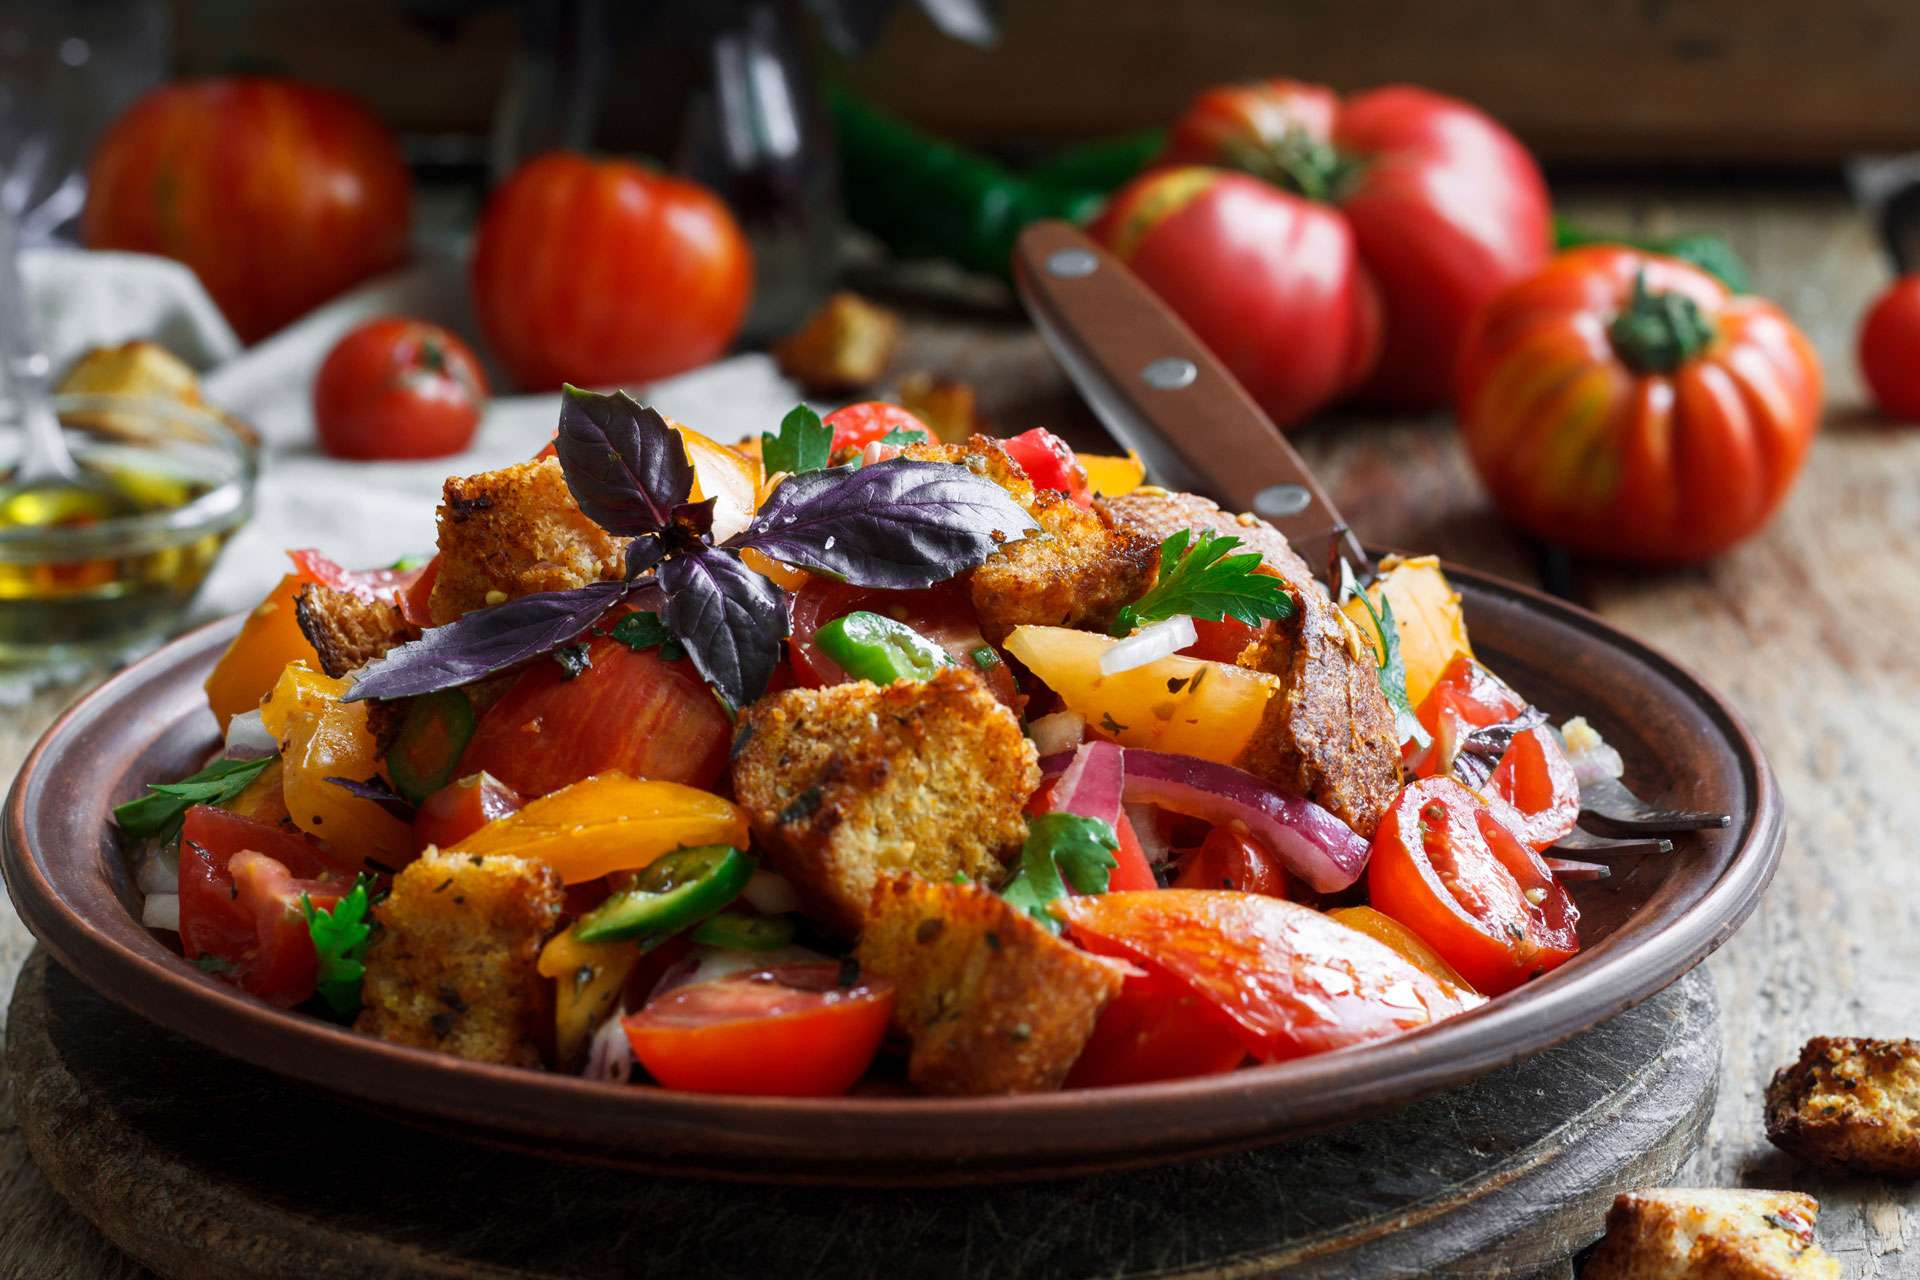 Tuscan Cuisine & Food